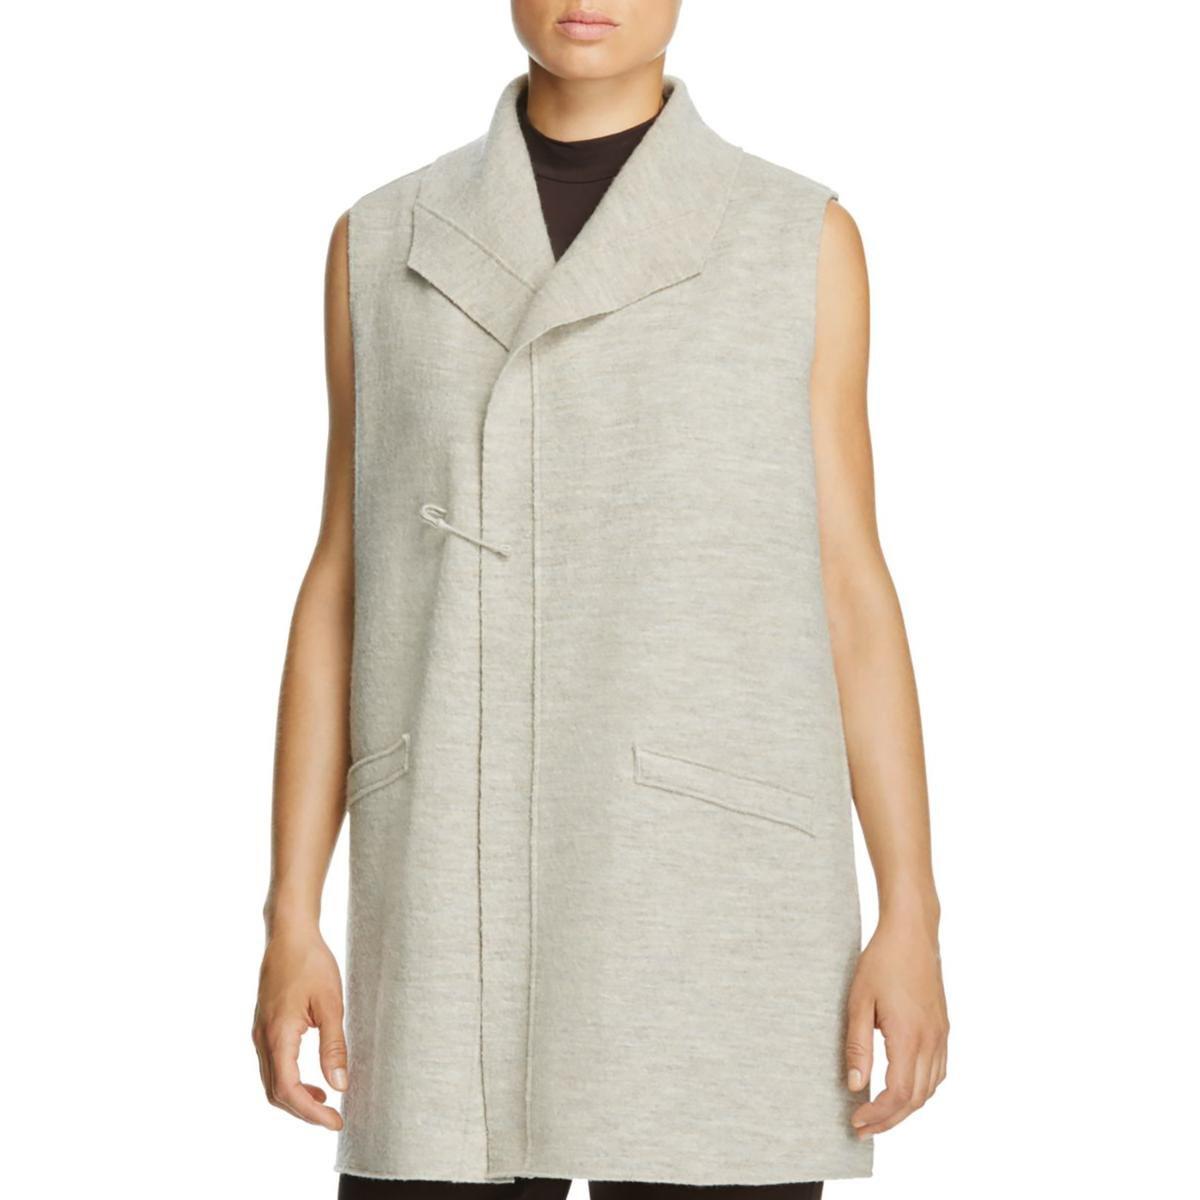 Eileen Fisher Womens Funnel Neck Sleeveless Sweater Vest Beige M